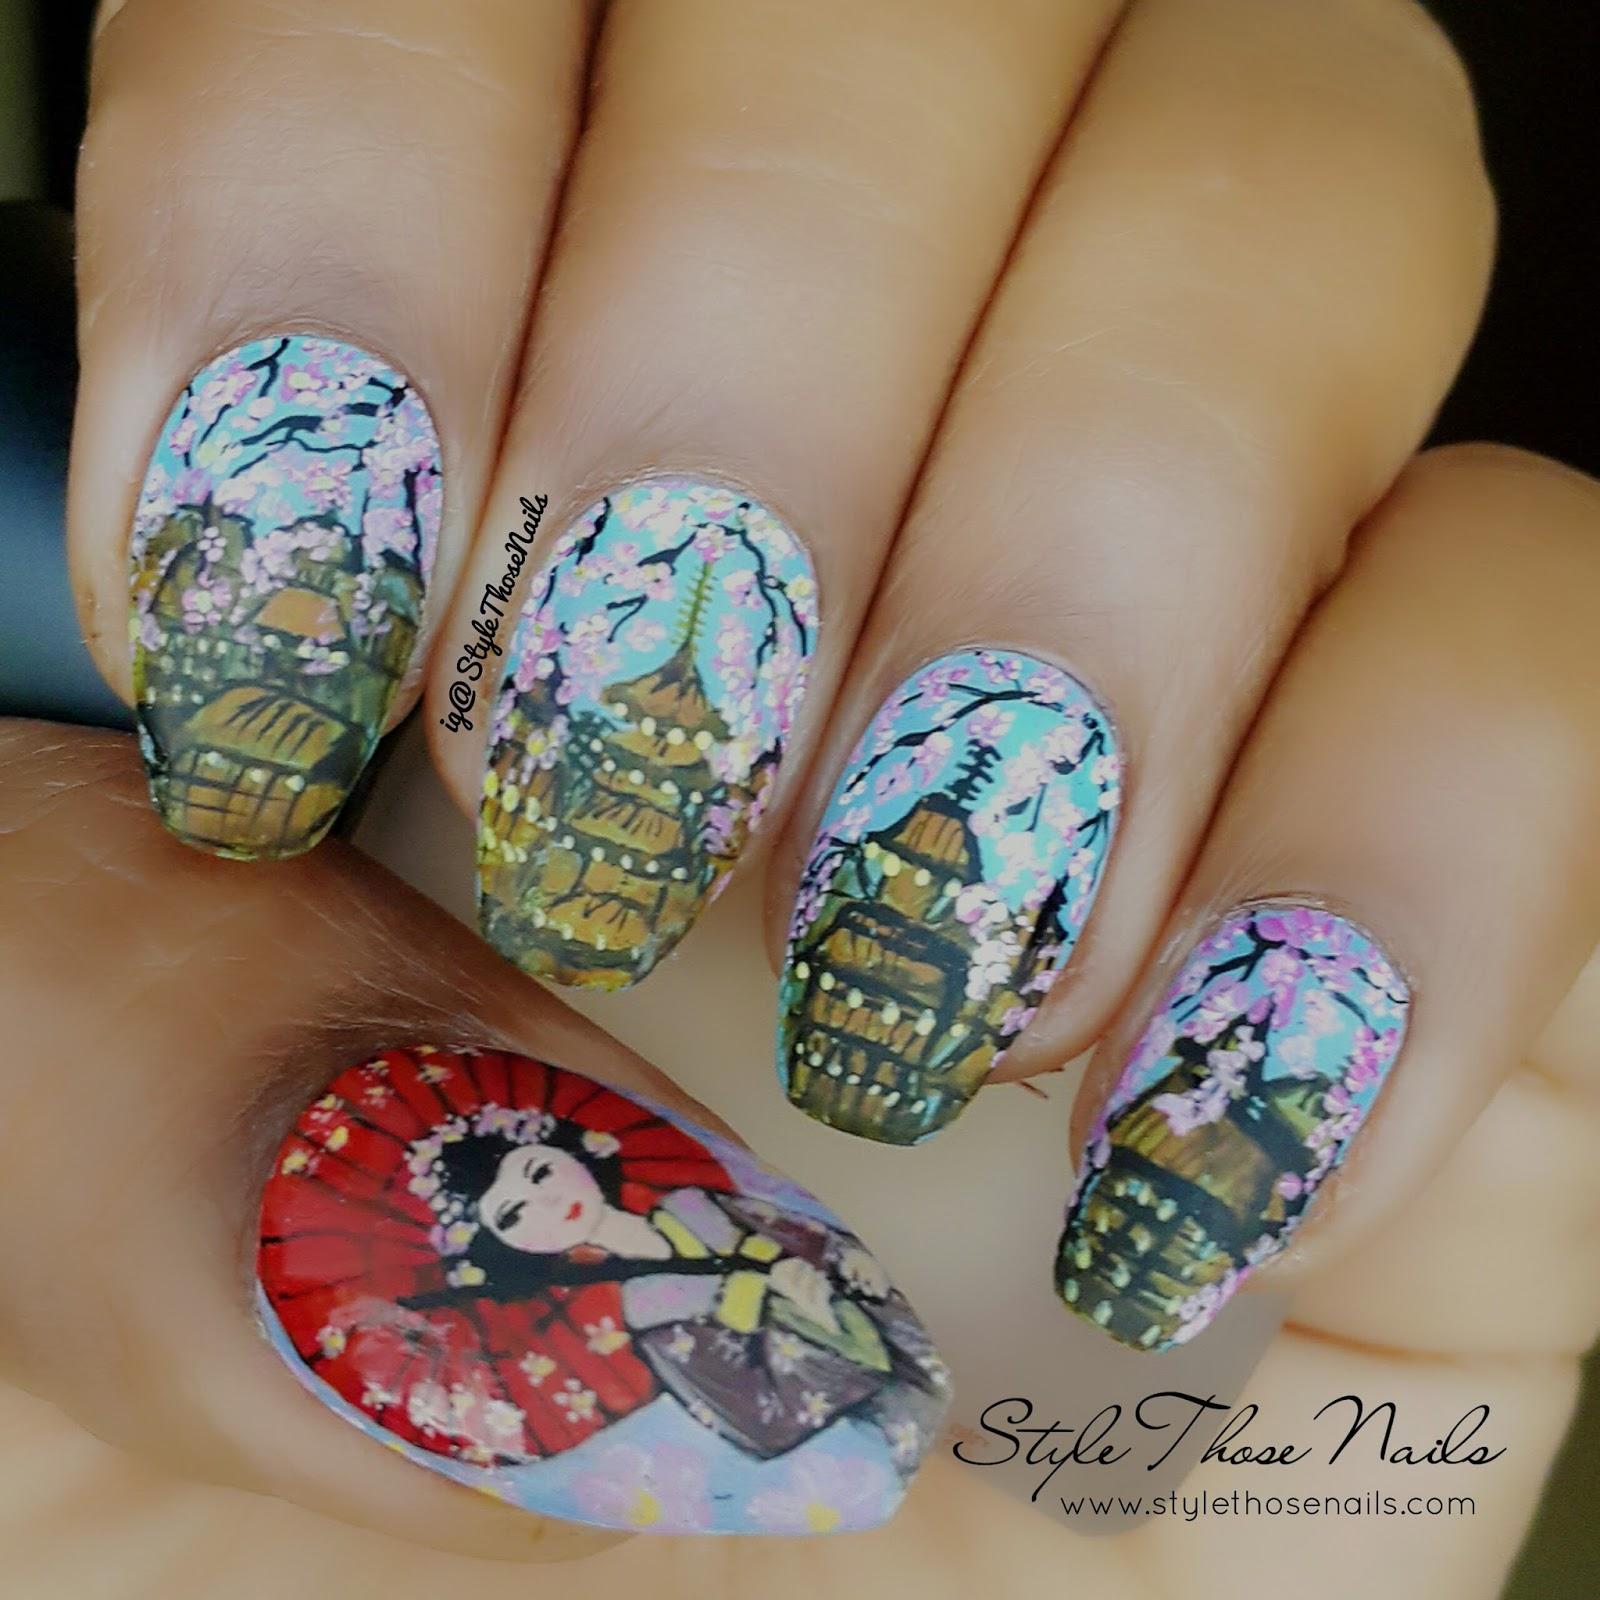 Style Those Nails: Geisha and Cherry Blossom Nail Art - Spring Nails ...